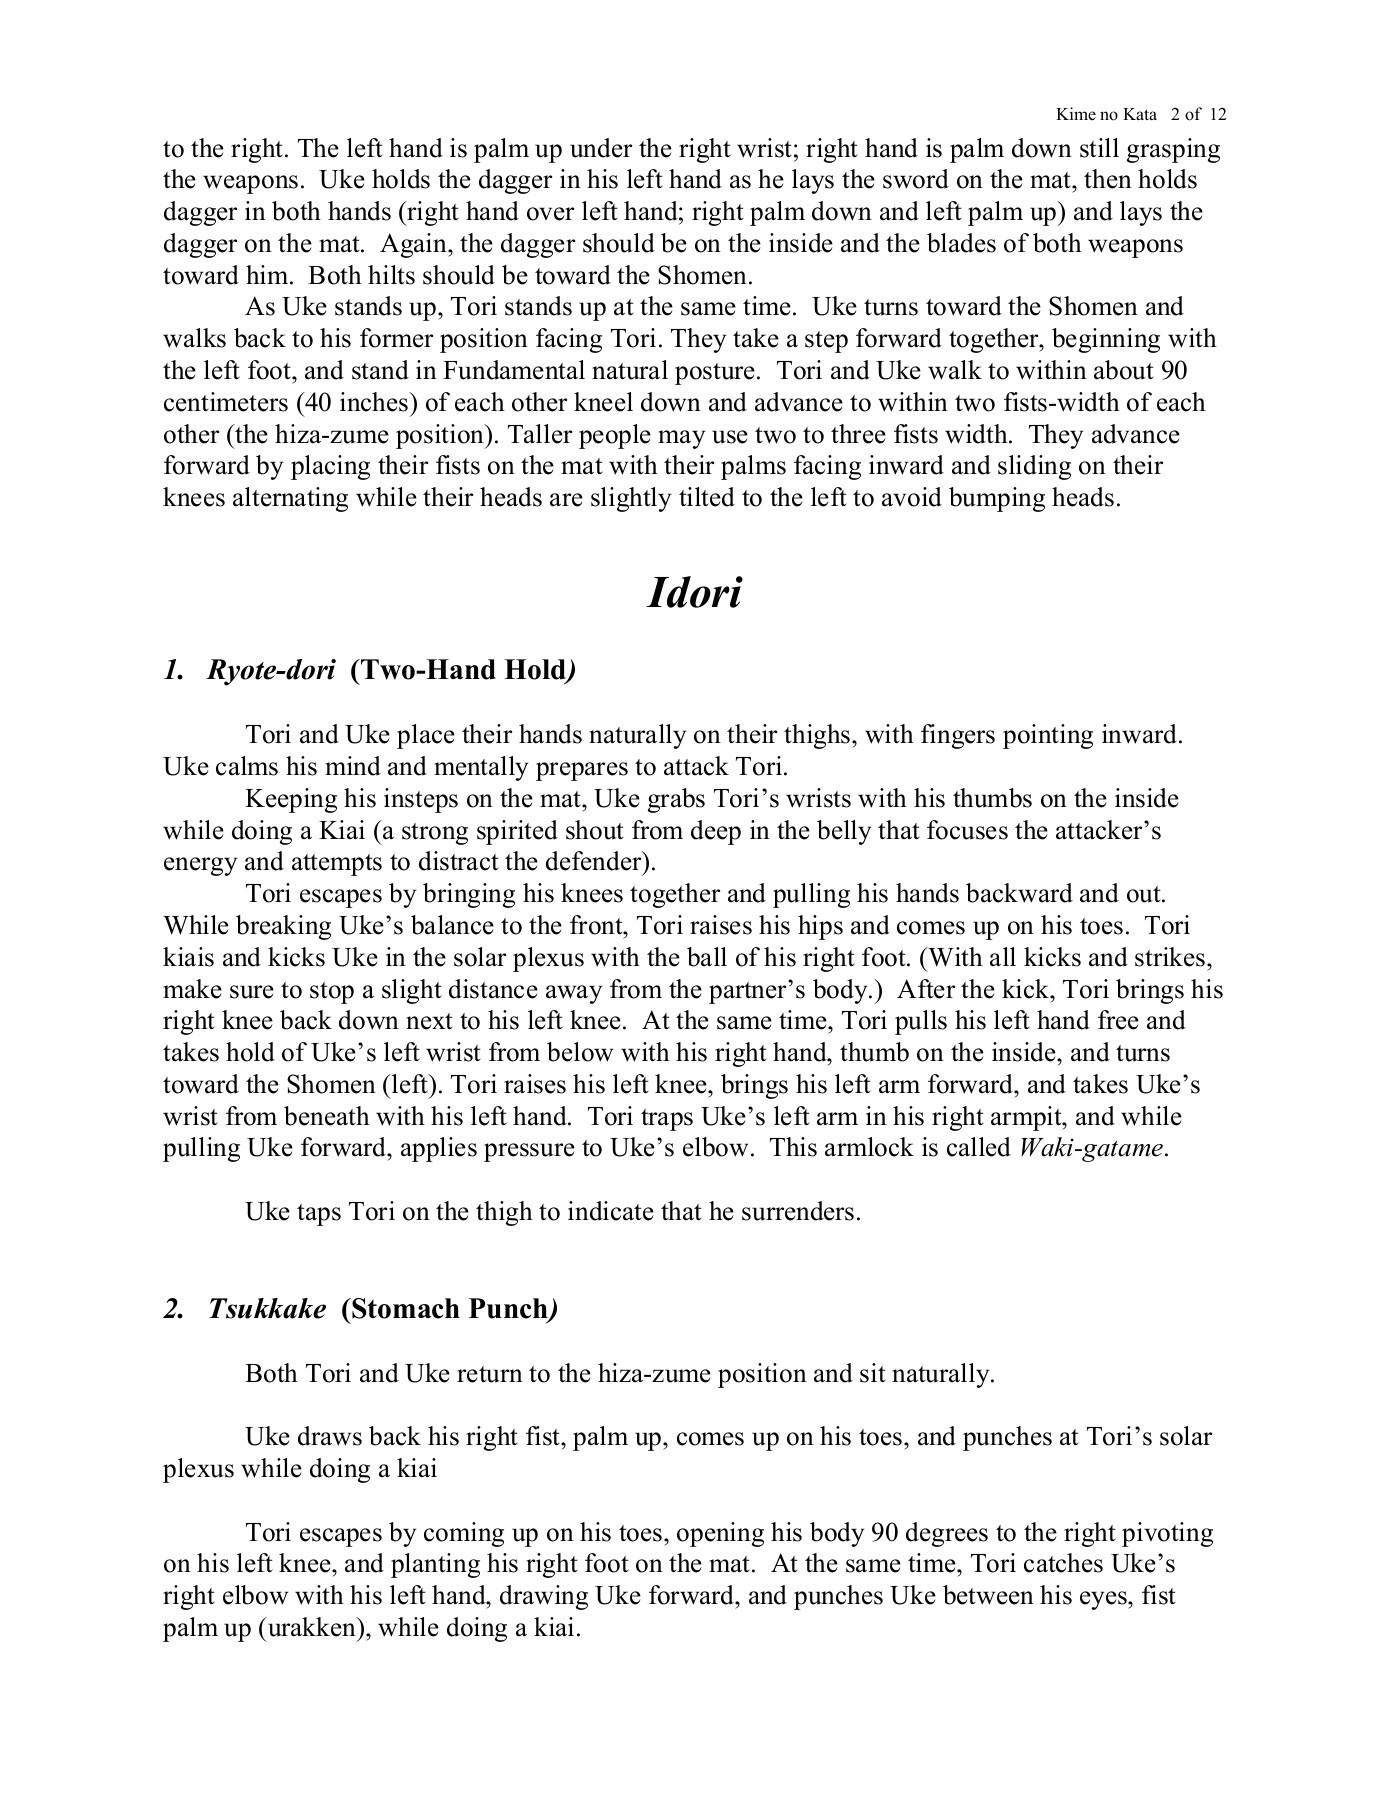 Considerable Kime No Kata Judo Info Pages Text Version Solar Plexus Punch Youtube Solar Plexus Punch Karate dpreview Solar Plexus Punch